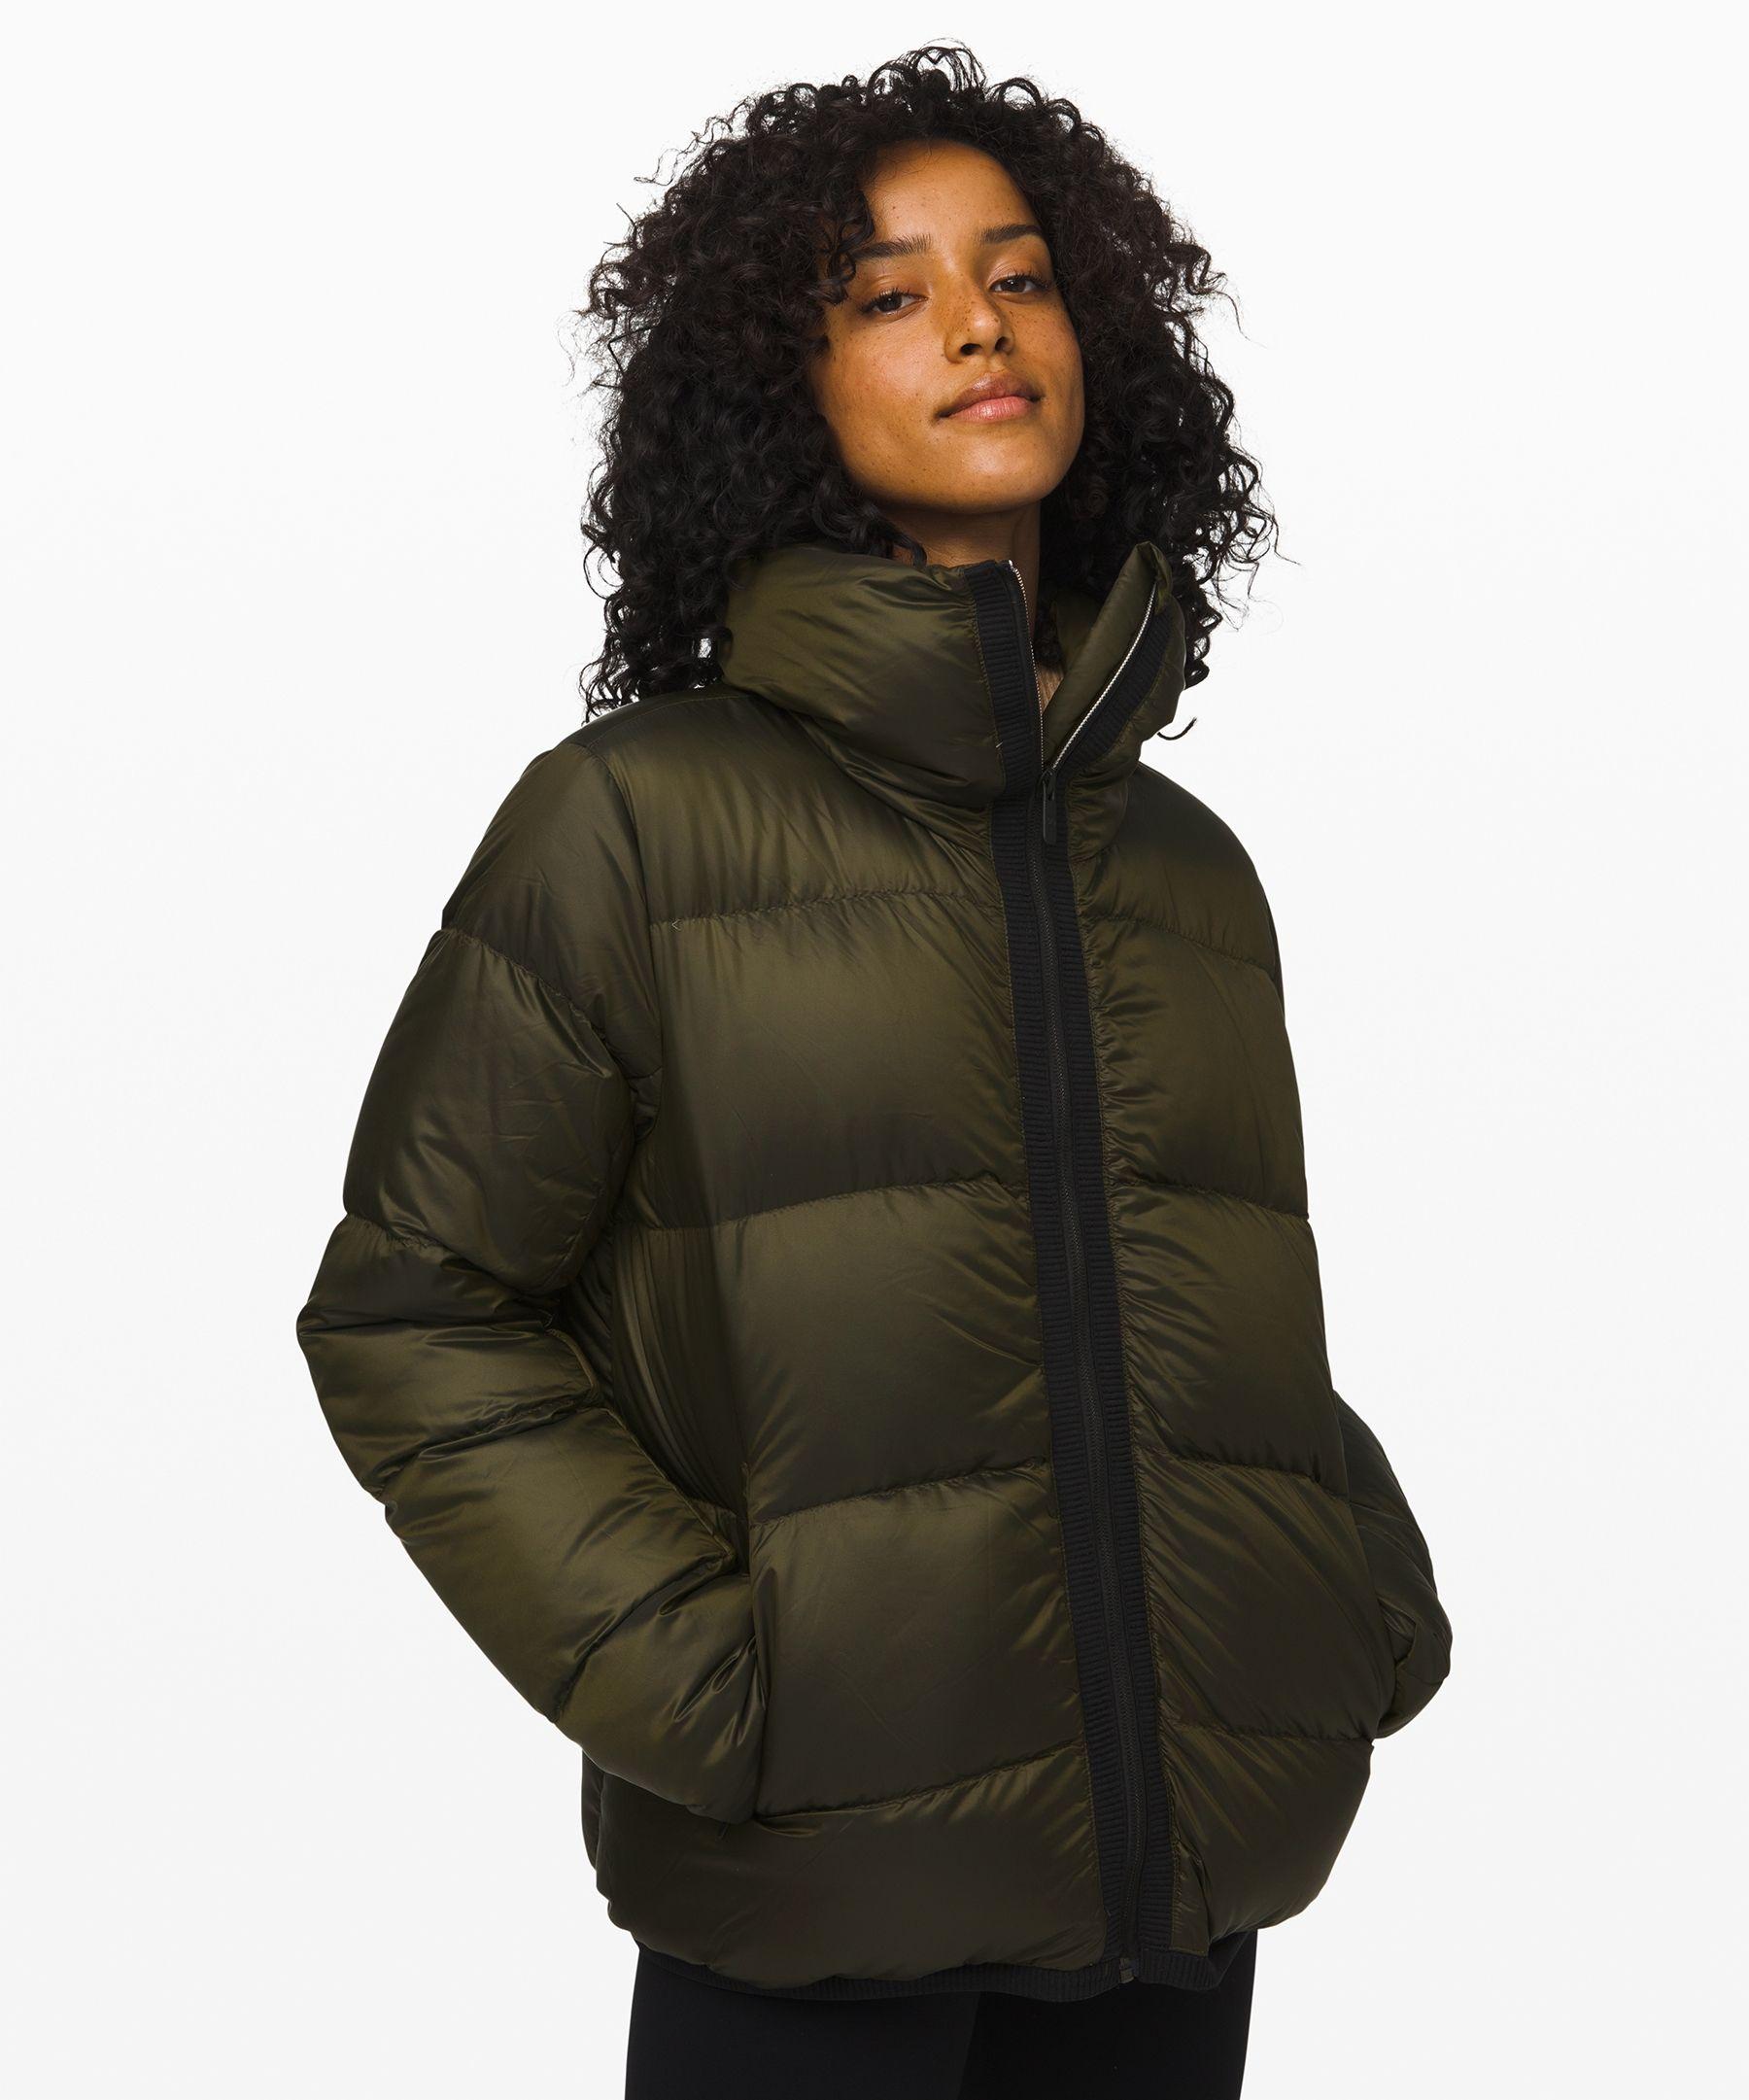 Lululemon Women S Cloudscape Jacket Dark Olive Size 4 Jackets How To Wear Ankle Boots Jackets For Women [ 2161 x 1800 Pixel ]